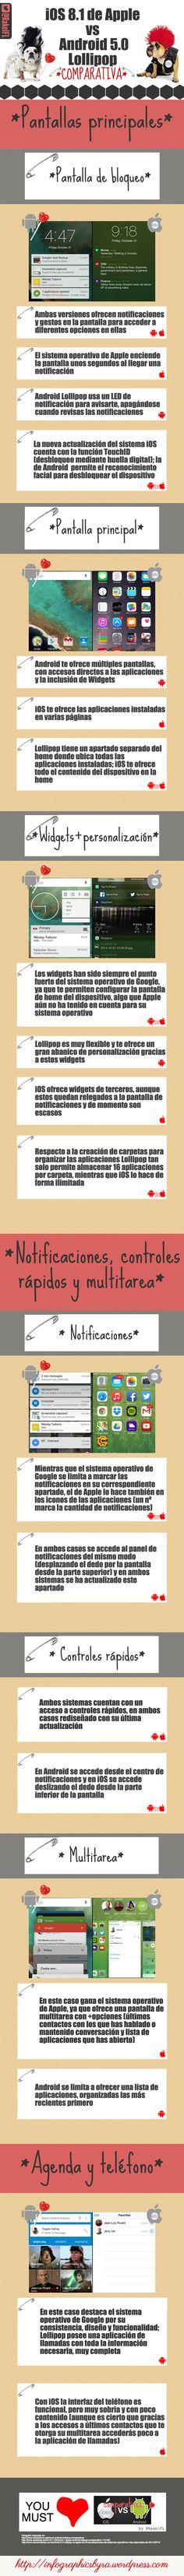 iOS8 de Apple o Android Lollipop...¿con cuál te quedas?, infografía comparativa de Rakel Felipe